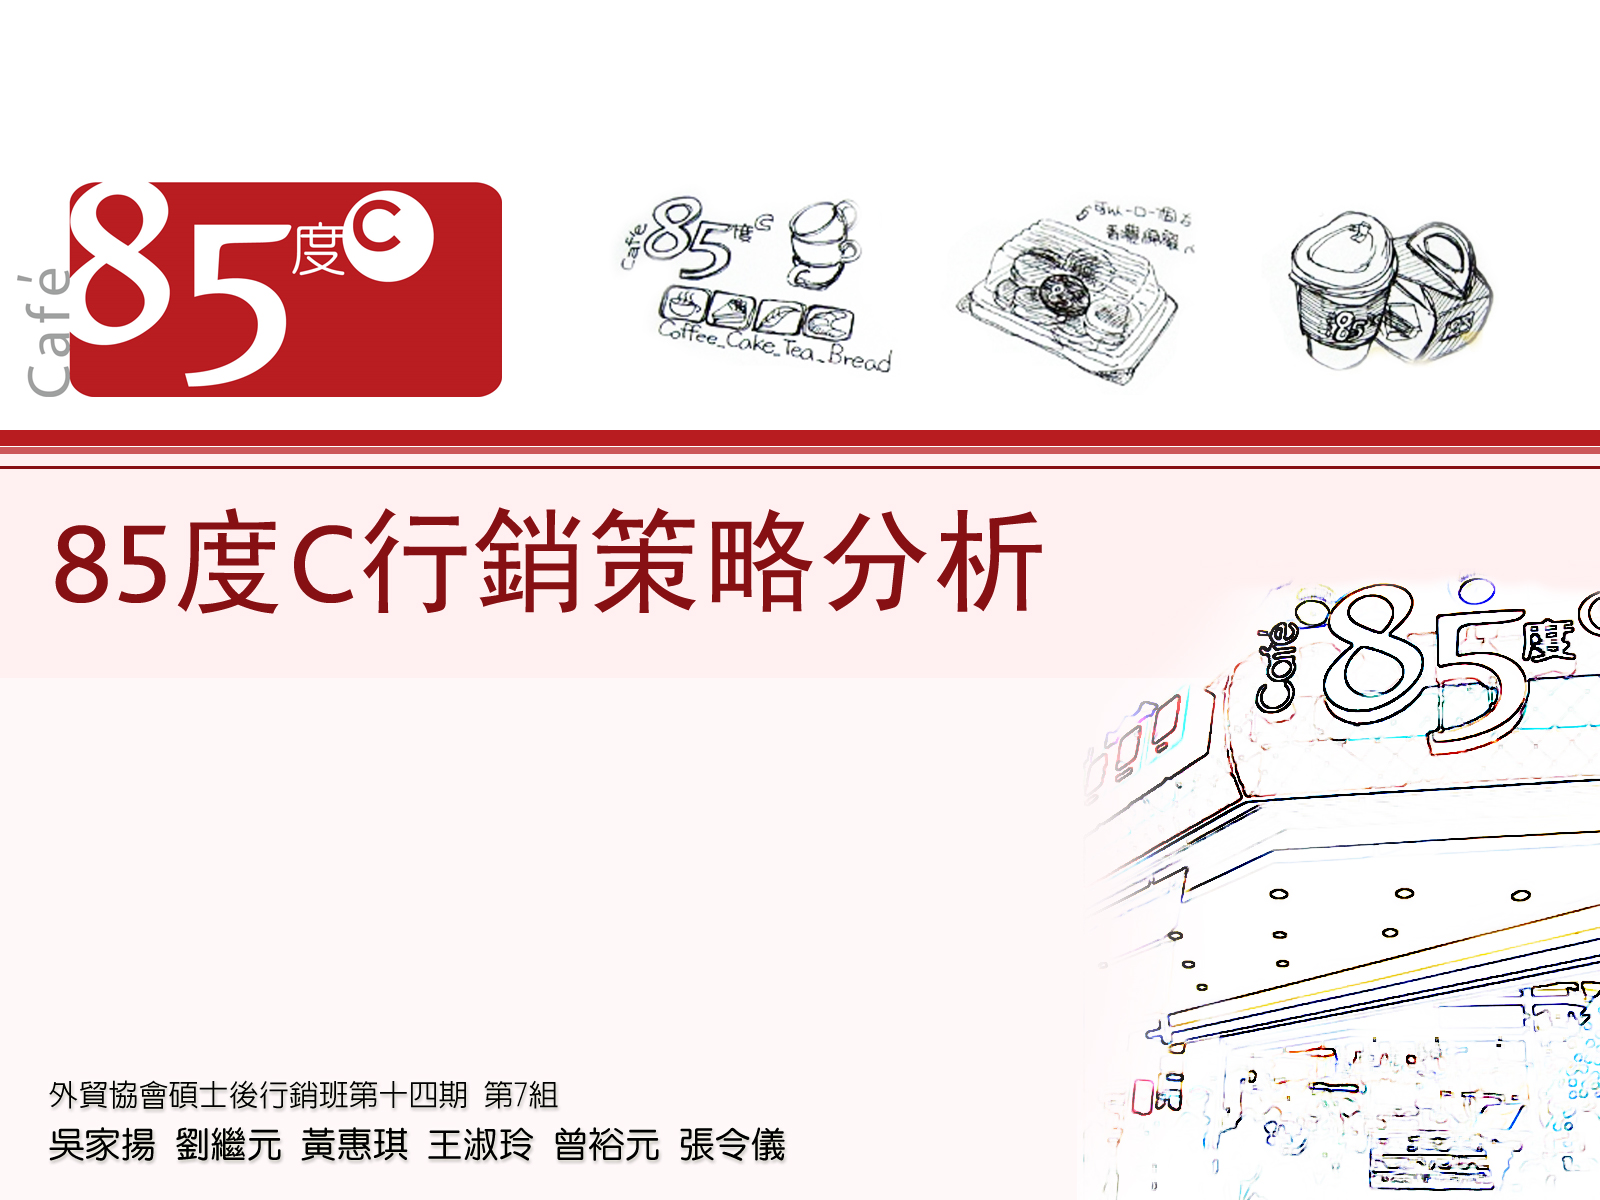 Ling's ArtBox: 85度C報告 投影片封面